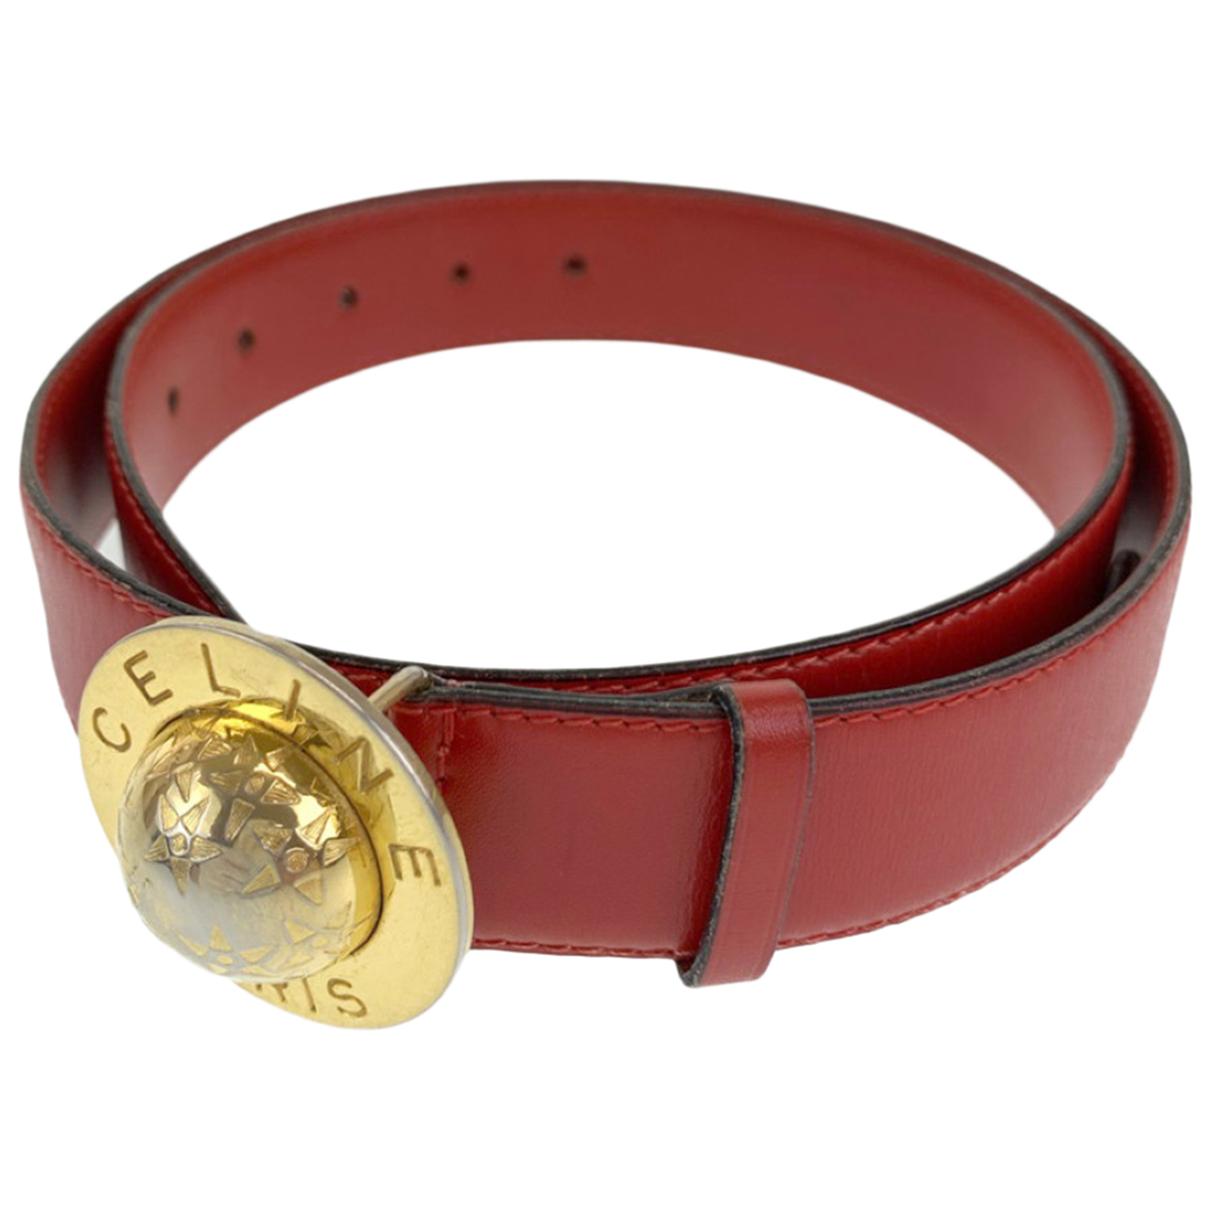 Celine N Red Leather belt for Women 75 cm